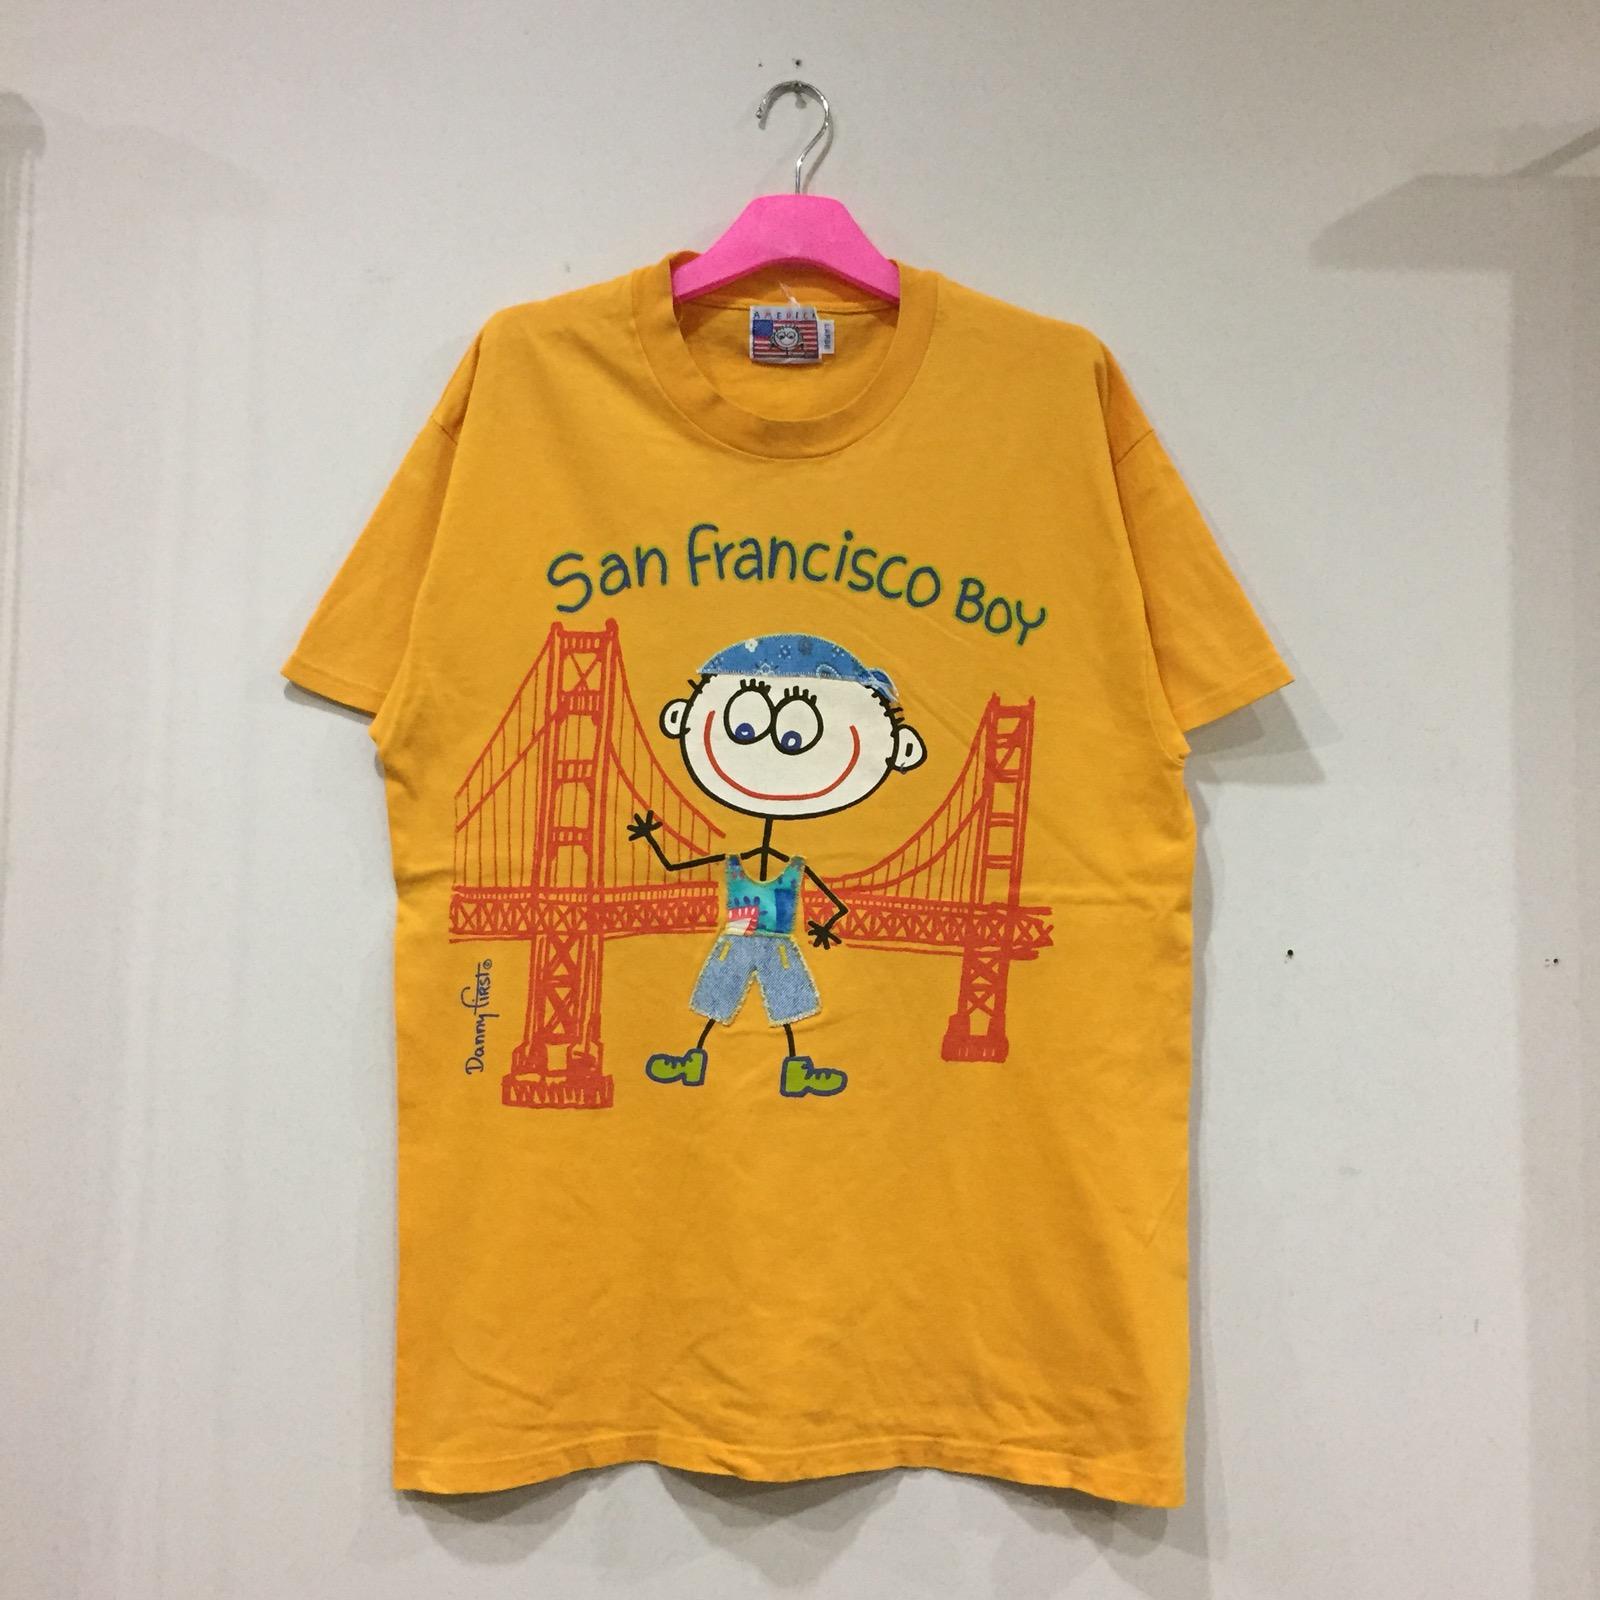 c0bc8b277 T Shirt Design San Francisco - Nils Stucki Kieferorthopäde